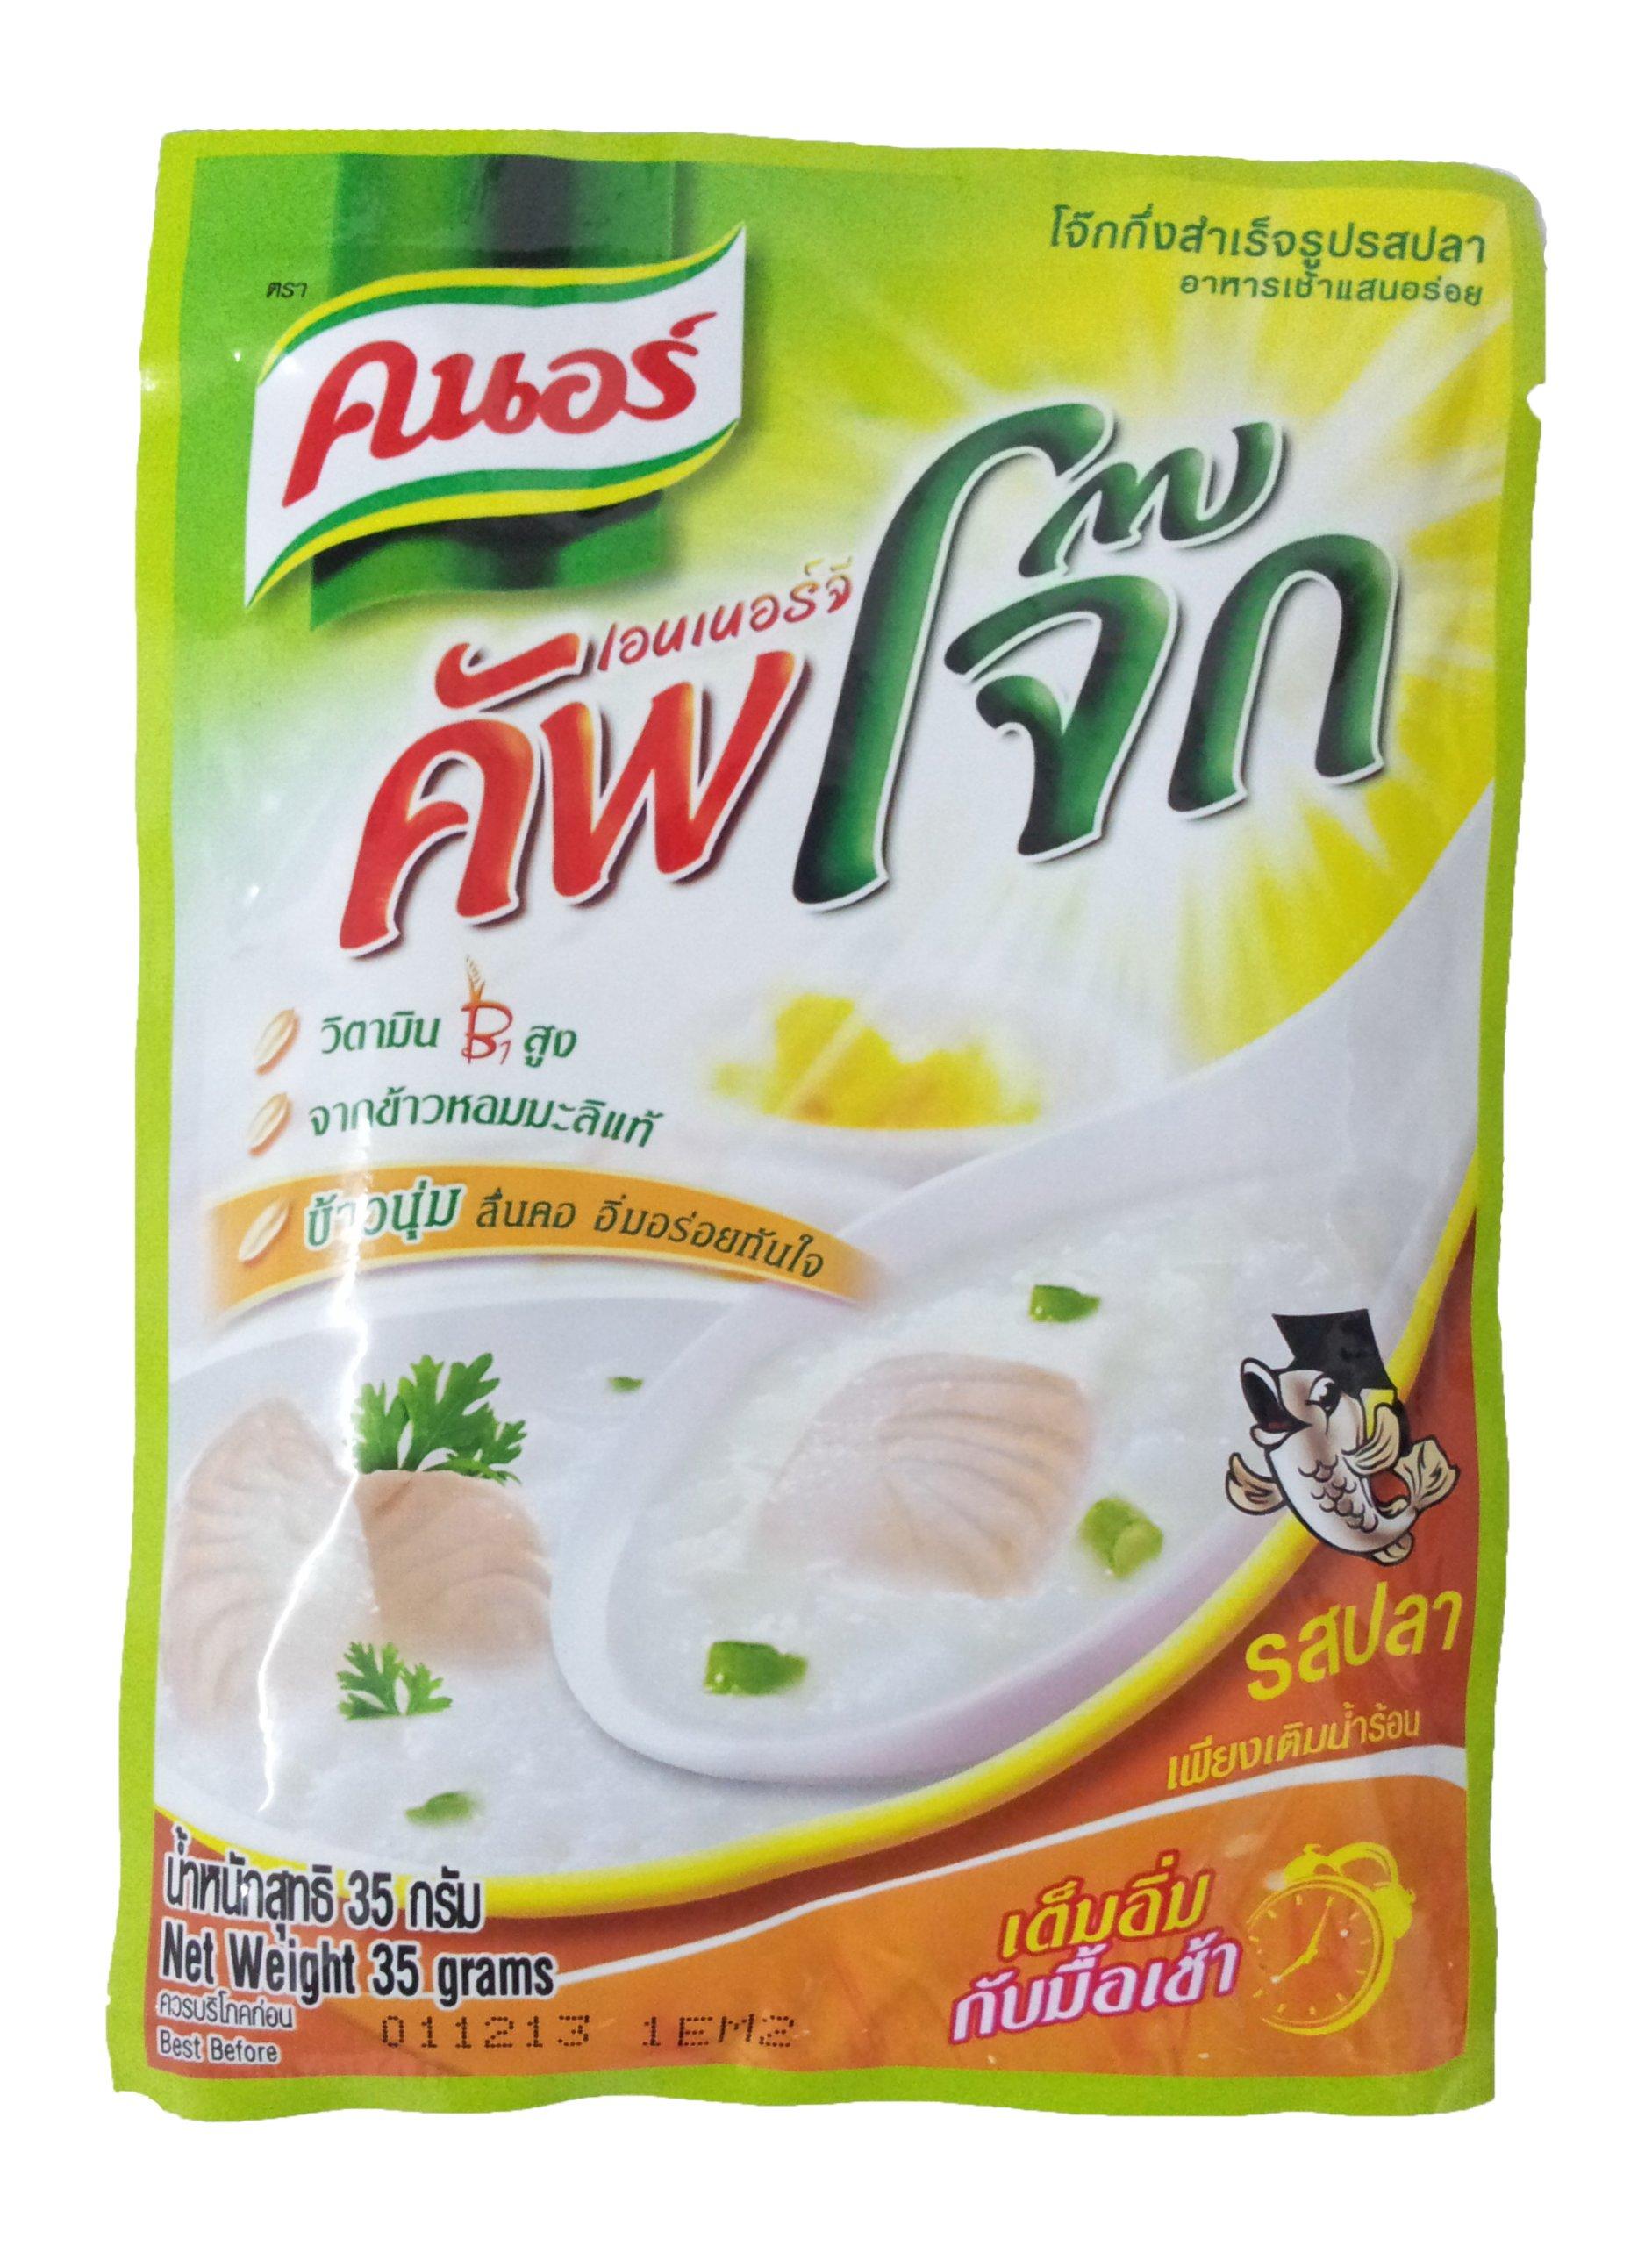 Knorr Instant Jasmine Rice Porridge Fish Flavor 35-grams Bag, 4 Count